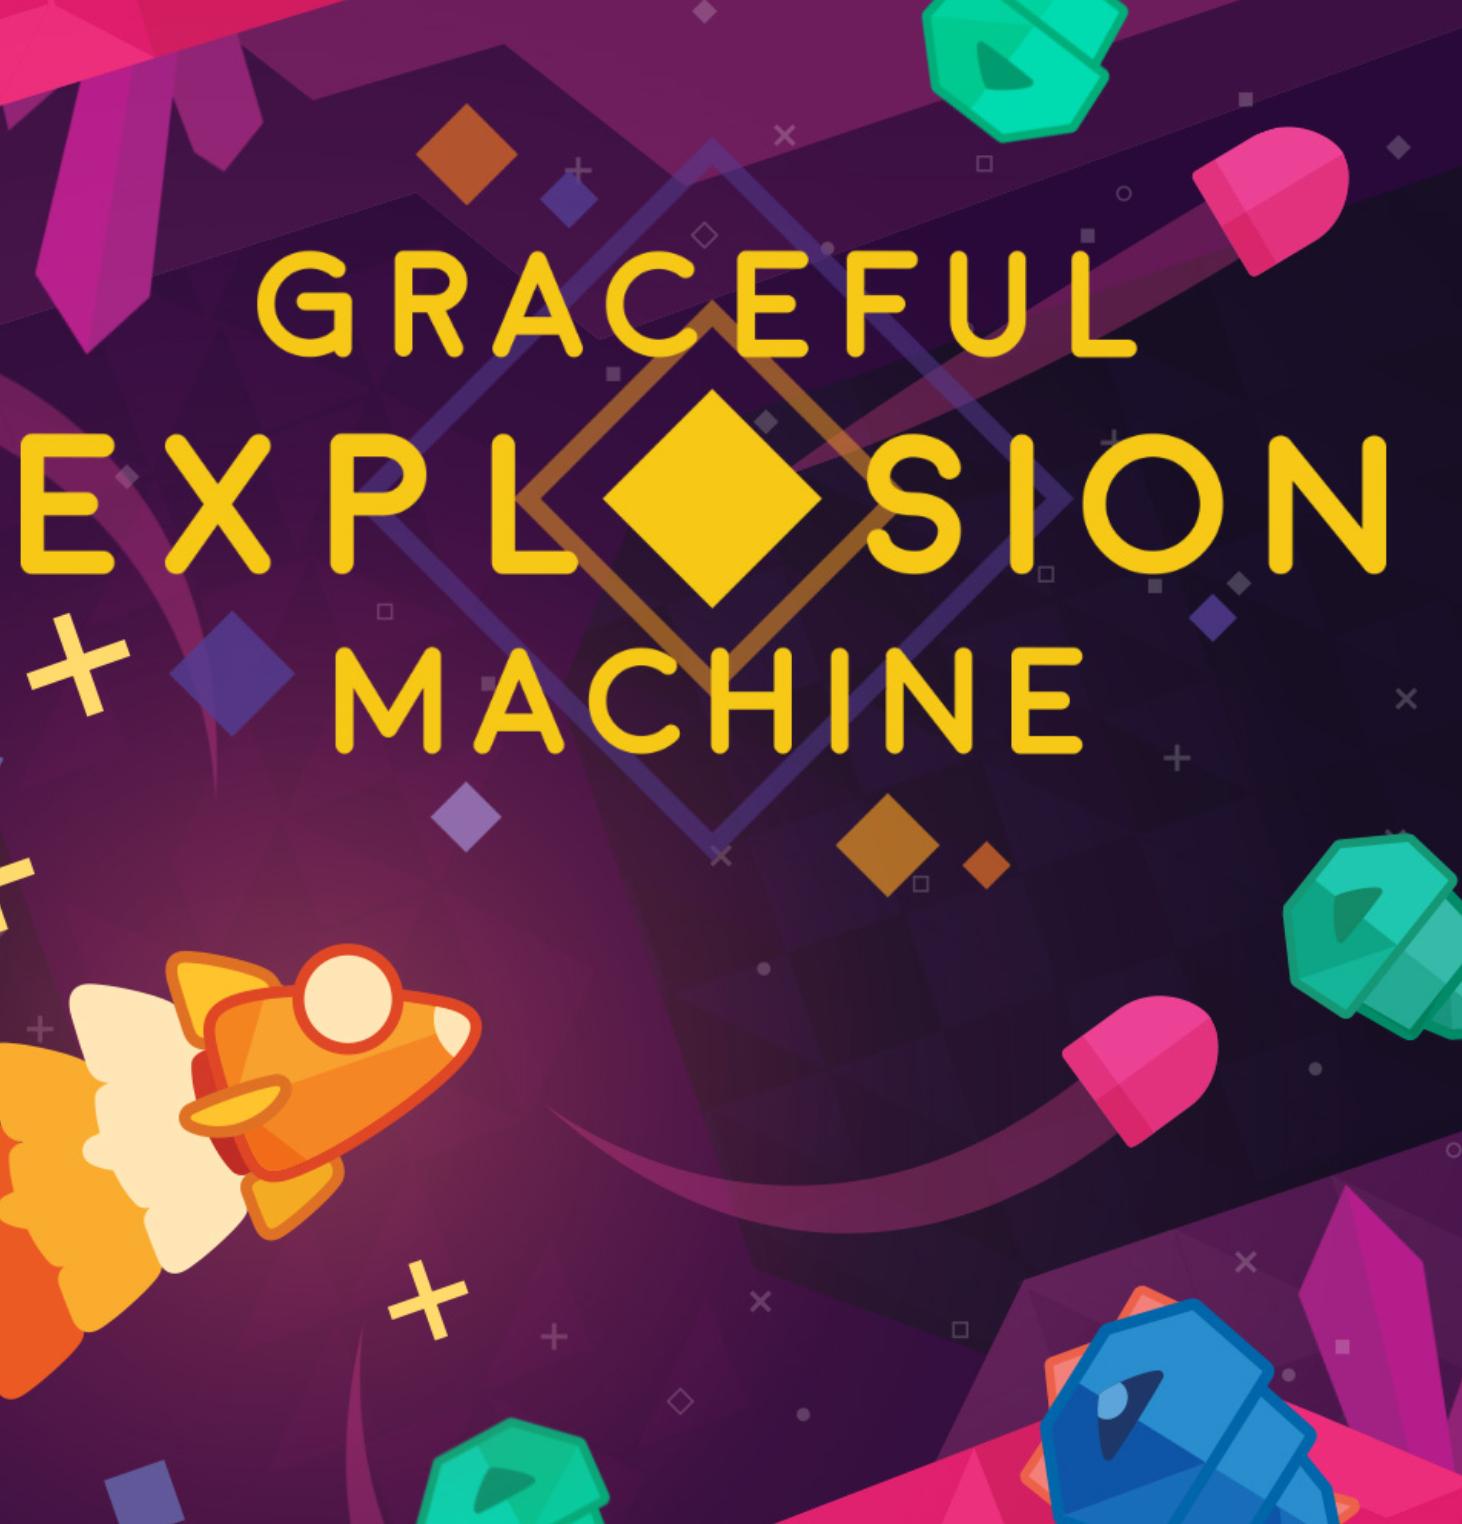 Nintendo Switch eShop Graceful Explosion 30% off now £6.99